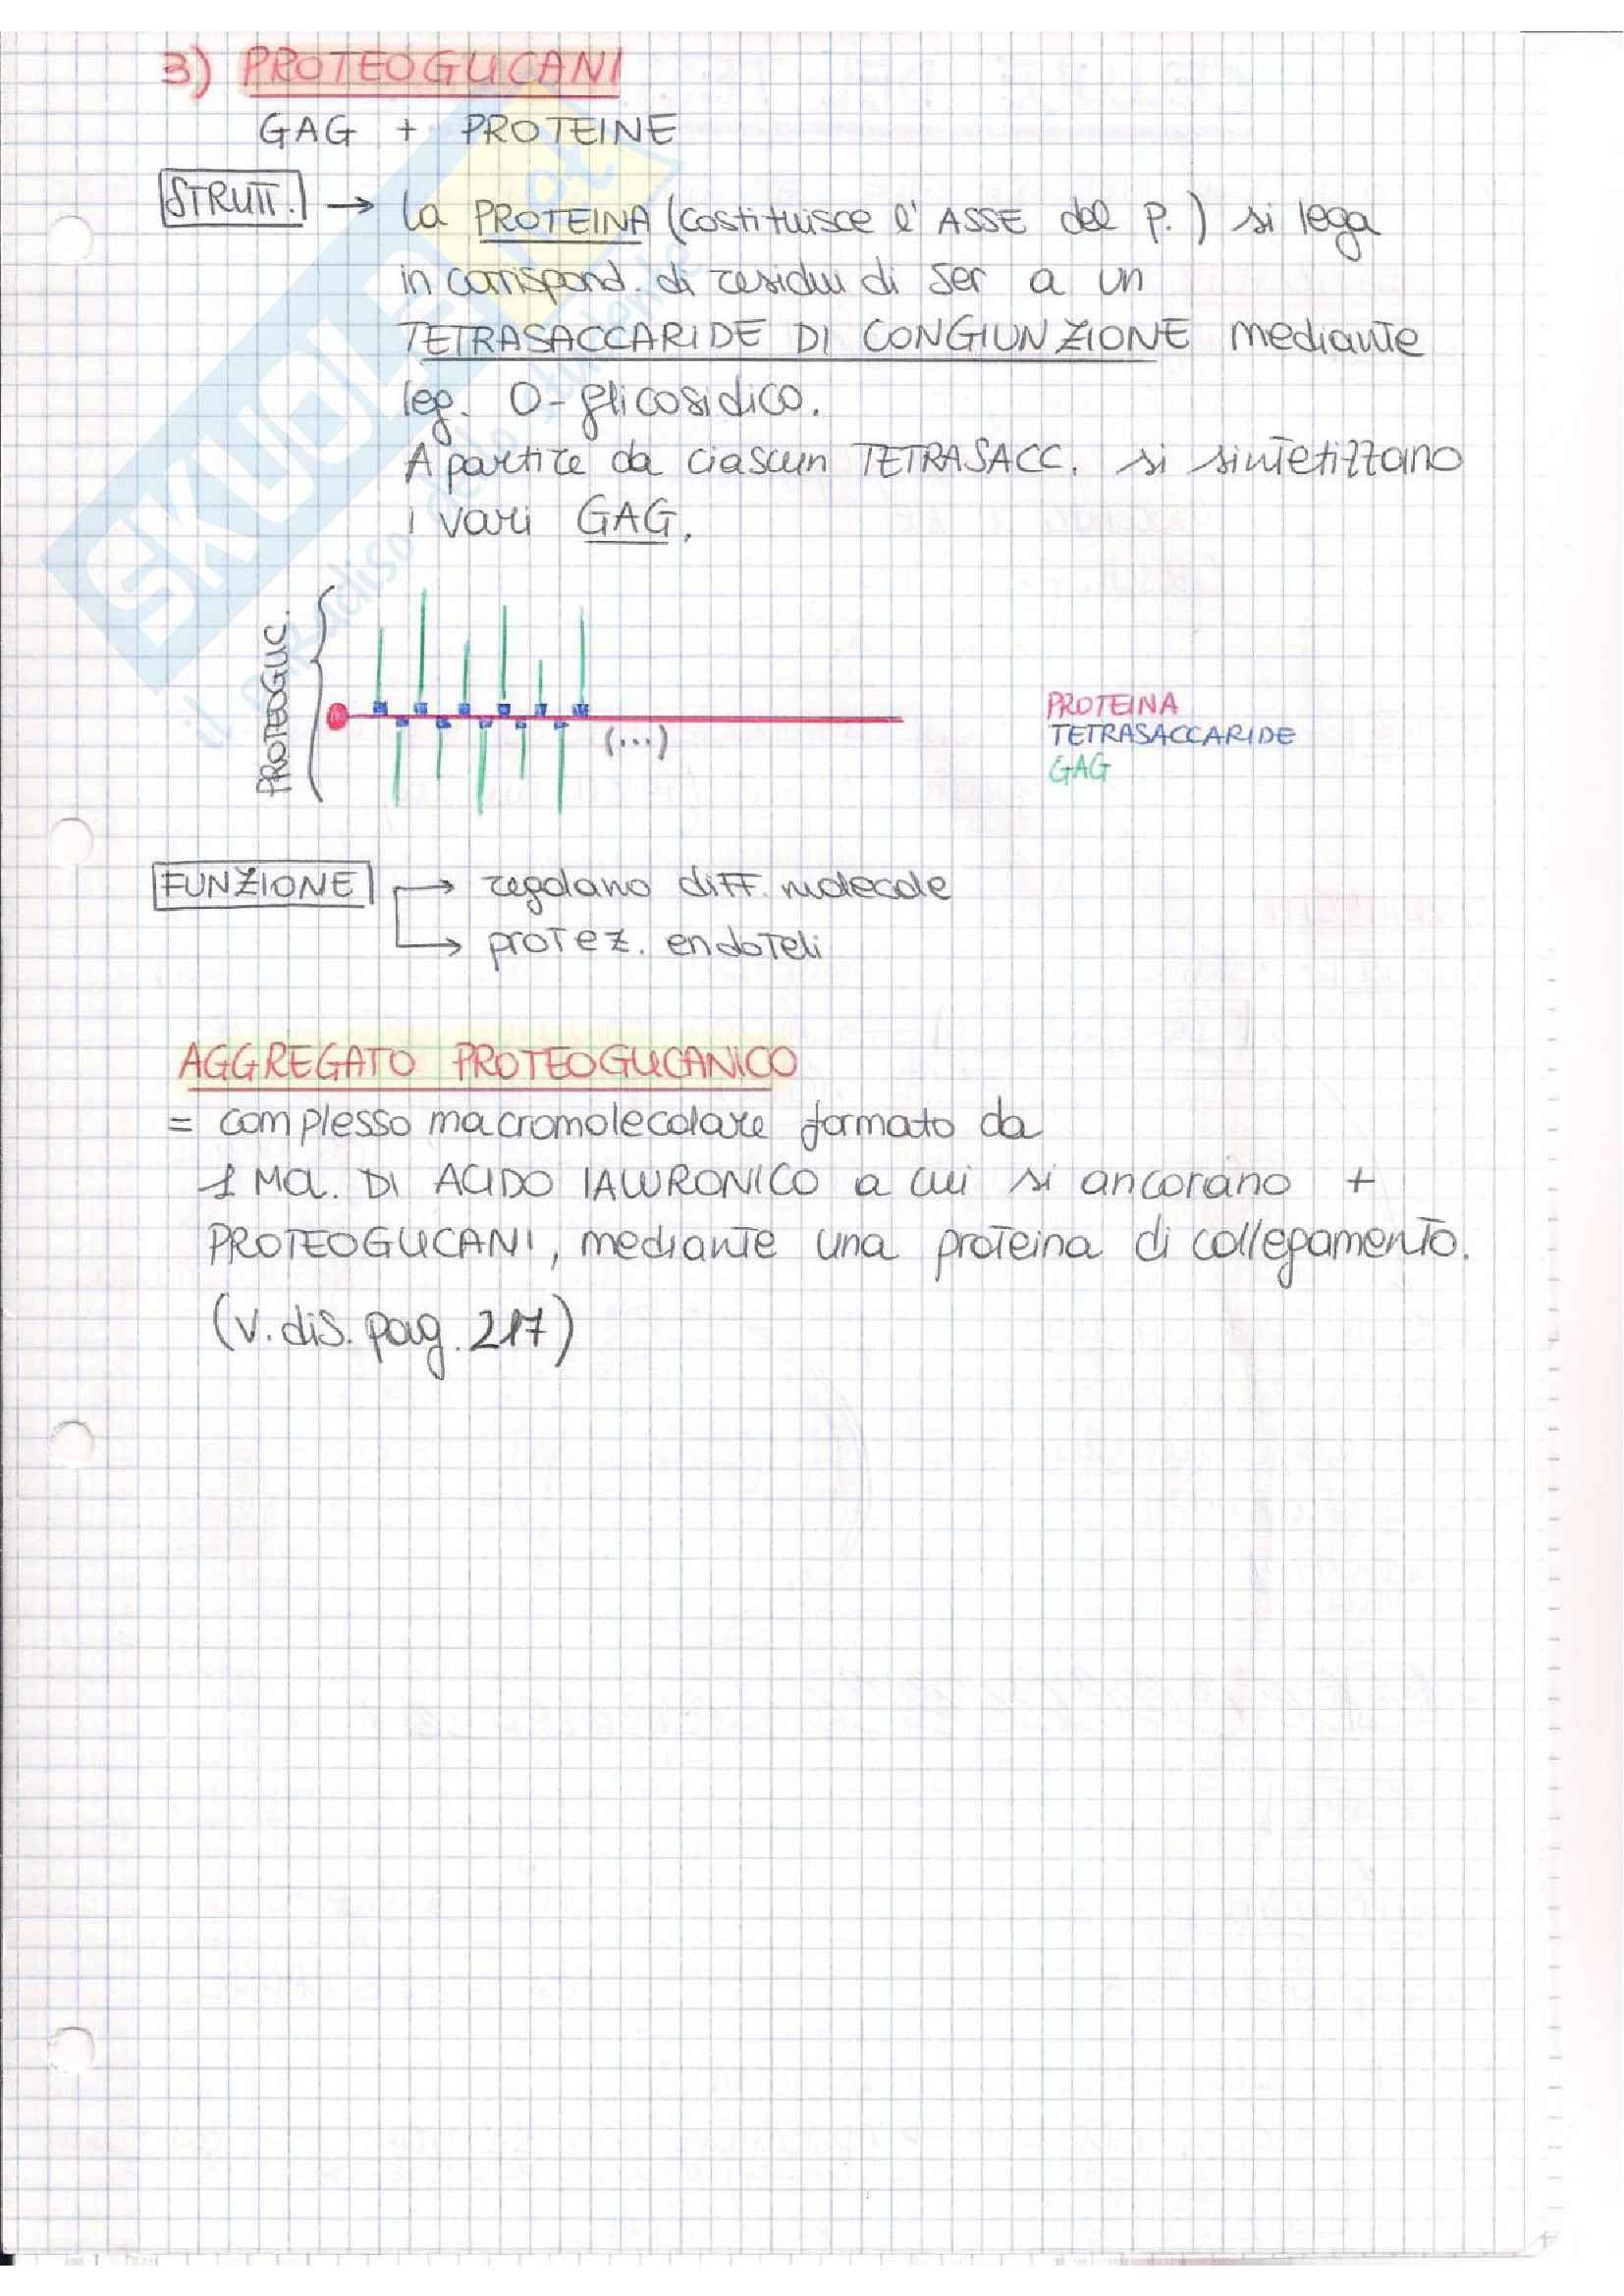 Istologia (esame istologia ed embriologia) Pag. 41